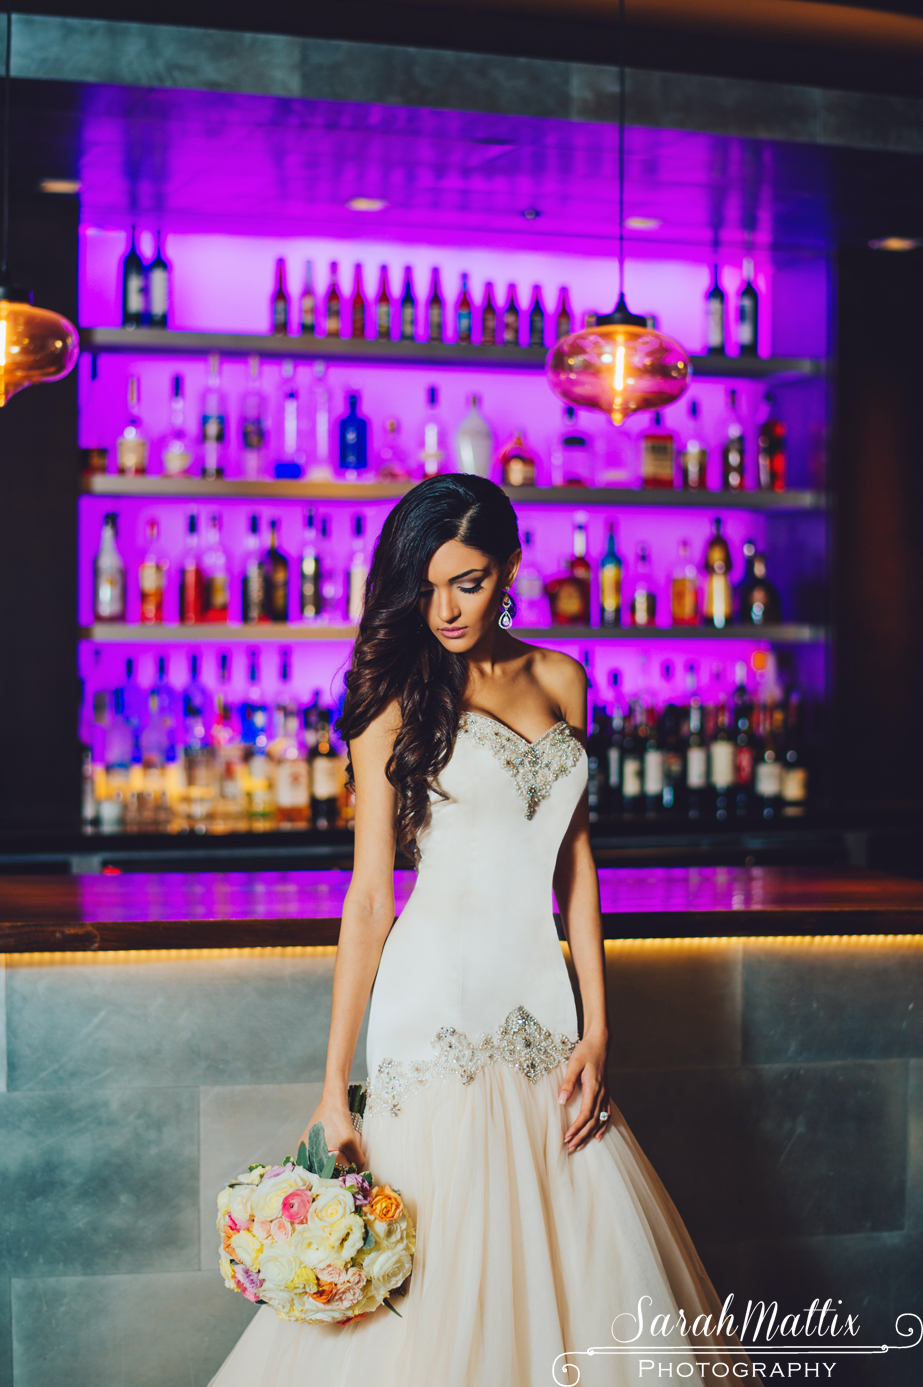 Hotel indigo brindiamo events new orleans wedding for Wedding dress rental baton rouge